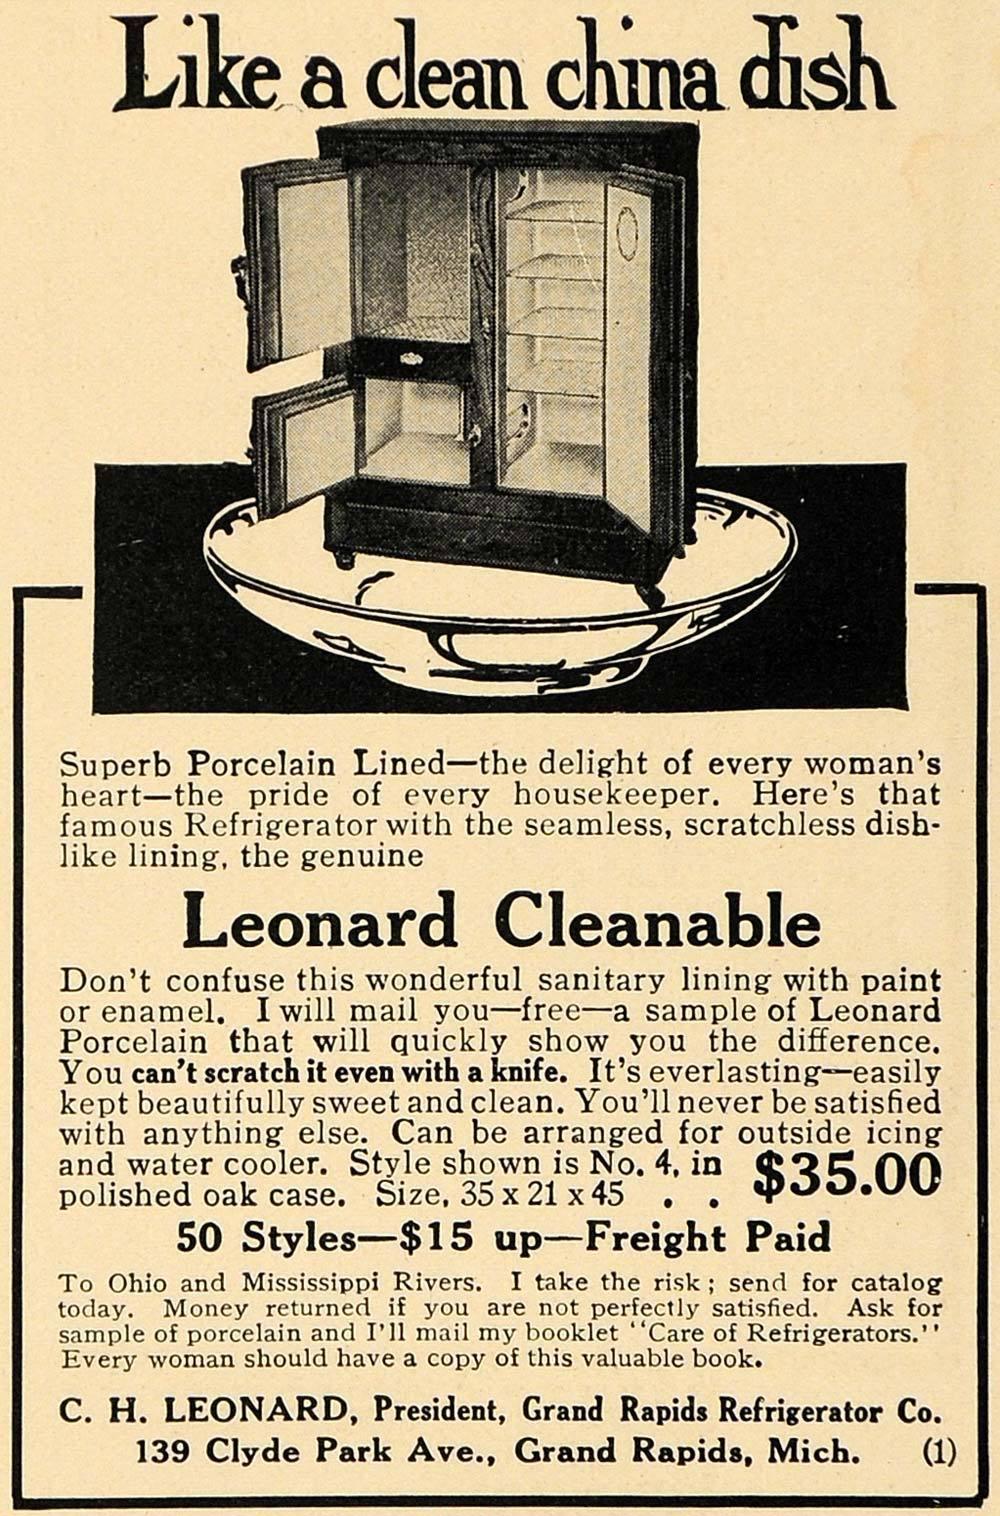 Leonard Cleanable Refrigerator 1914.JPG